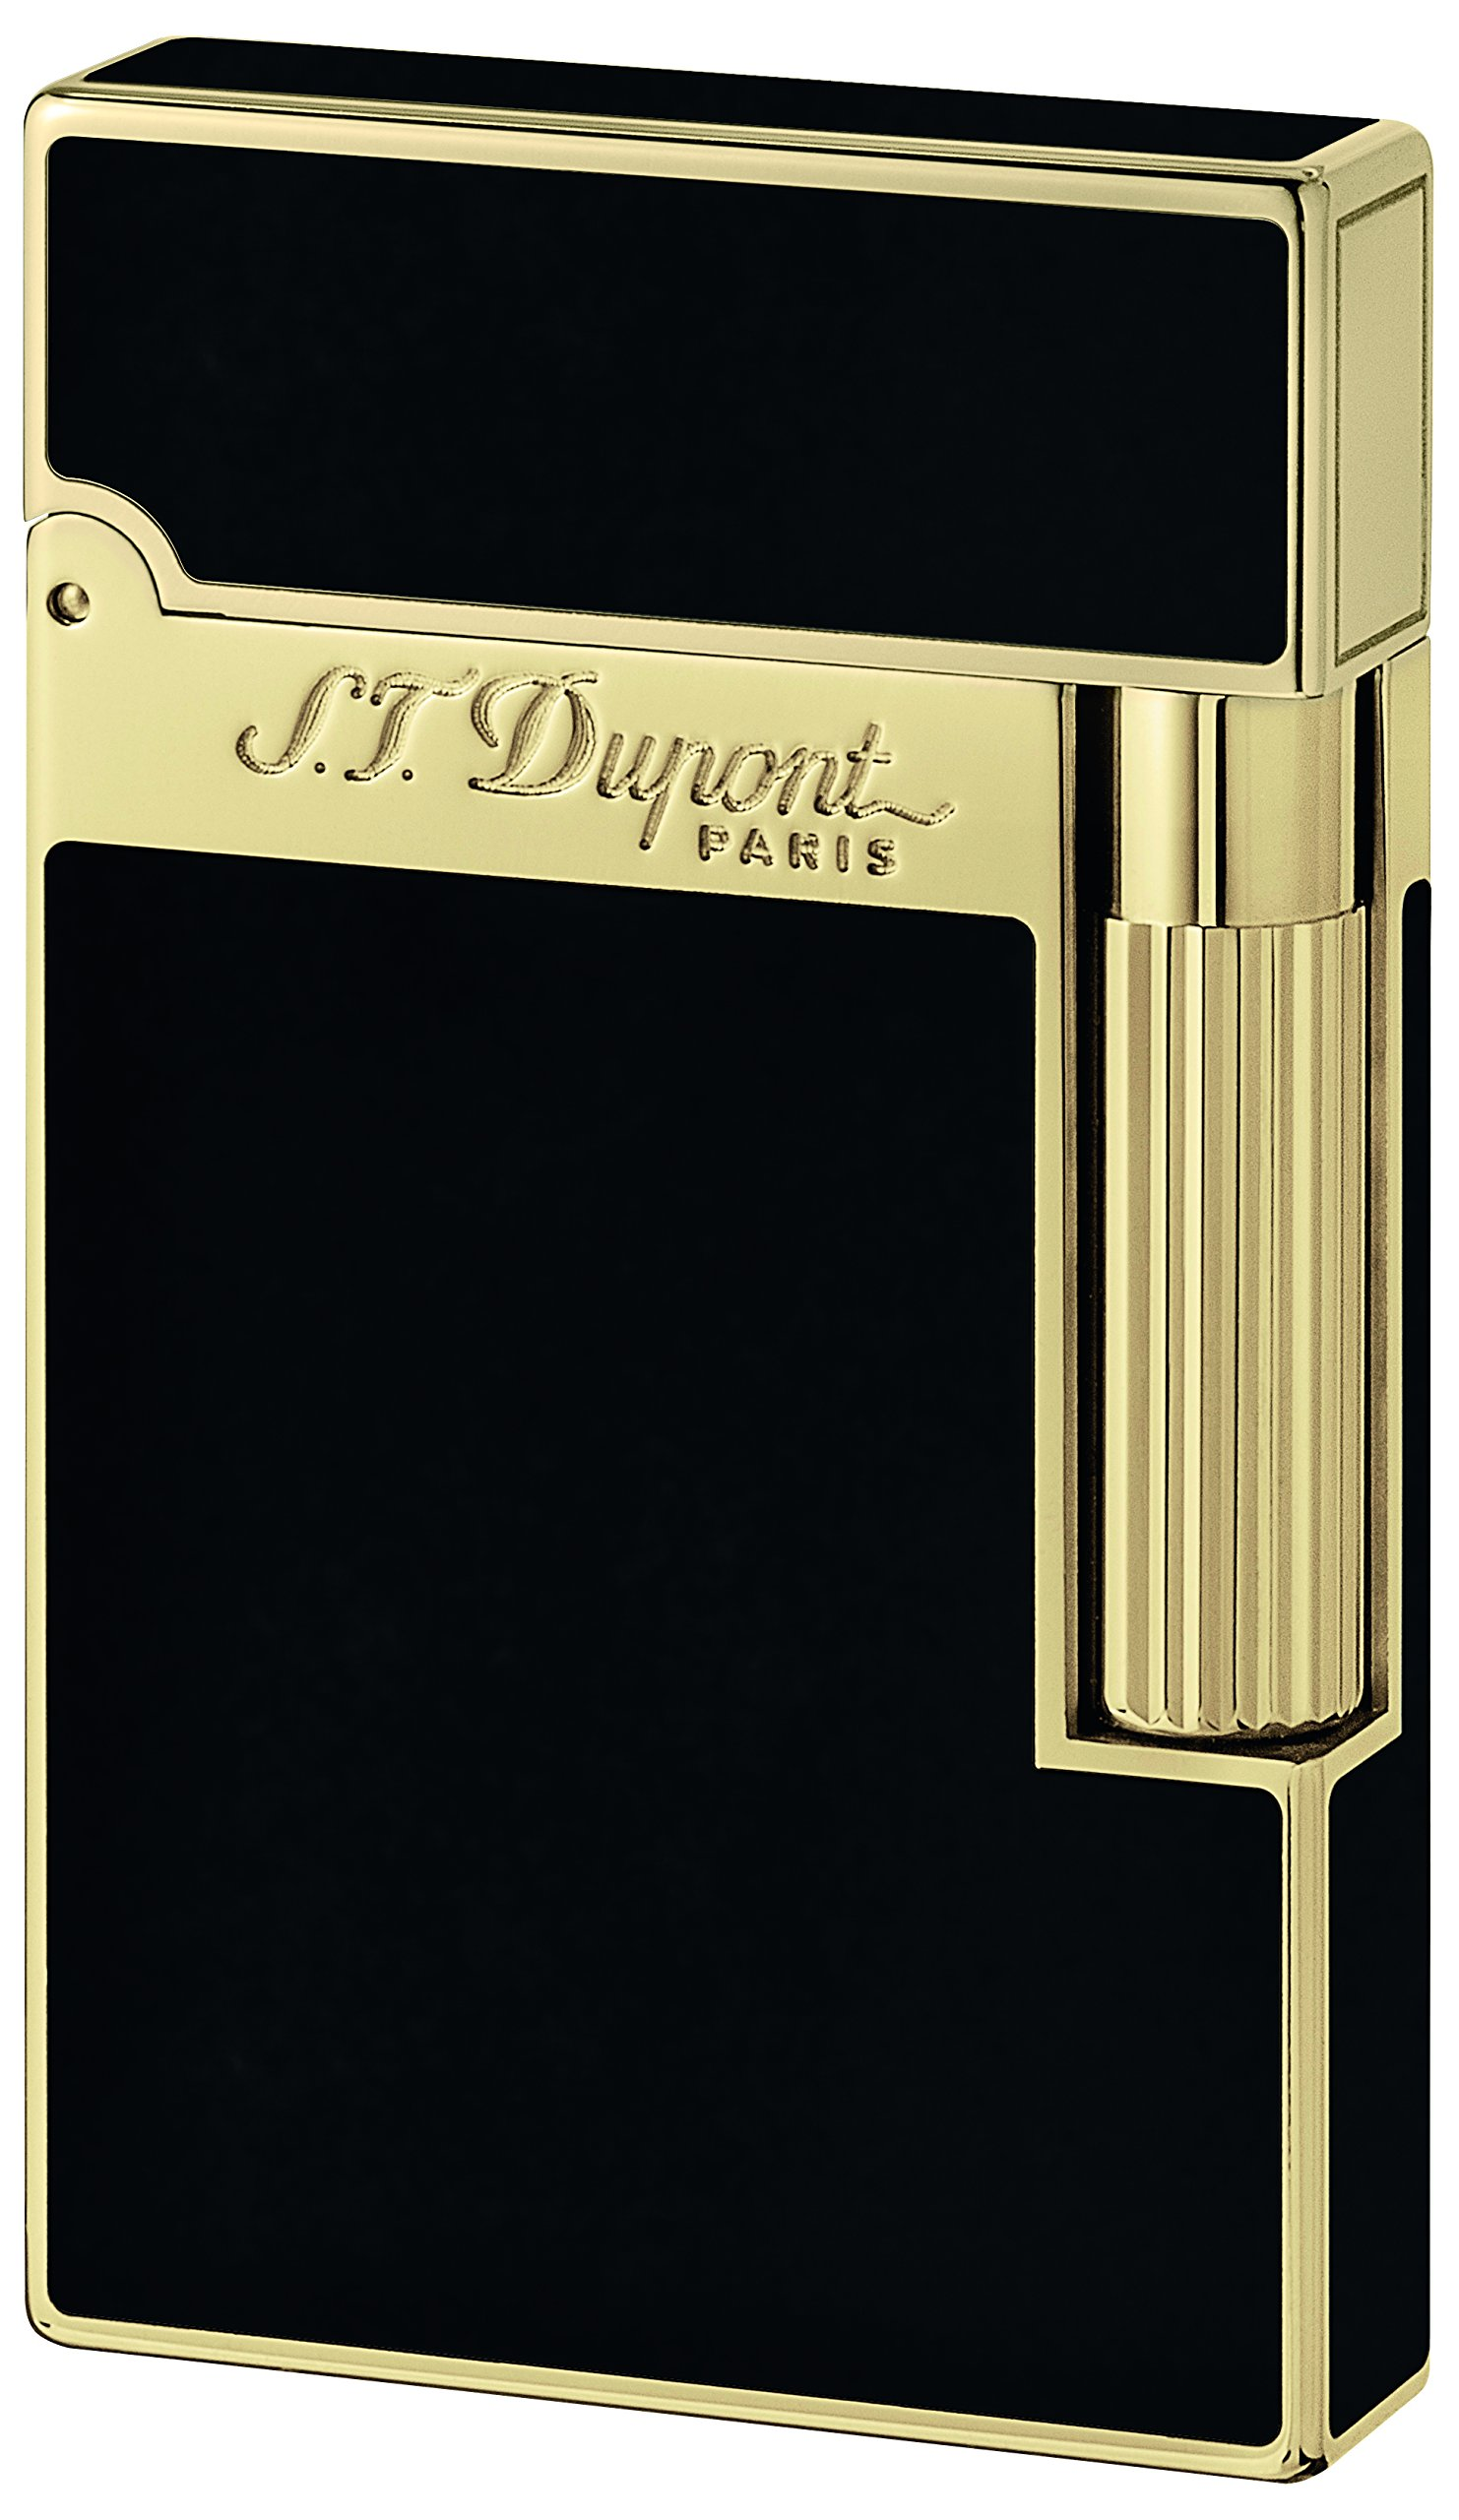 S.T. Dupont Ligne 2 Lacquer Lighter - Black/Gold 16884